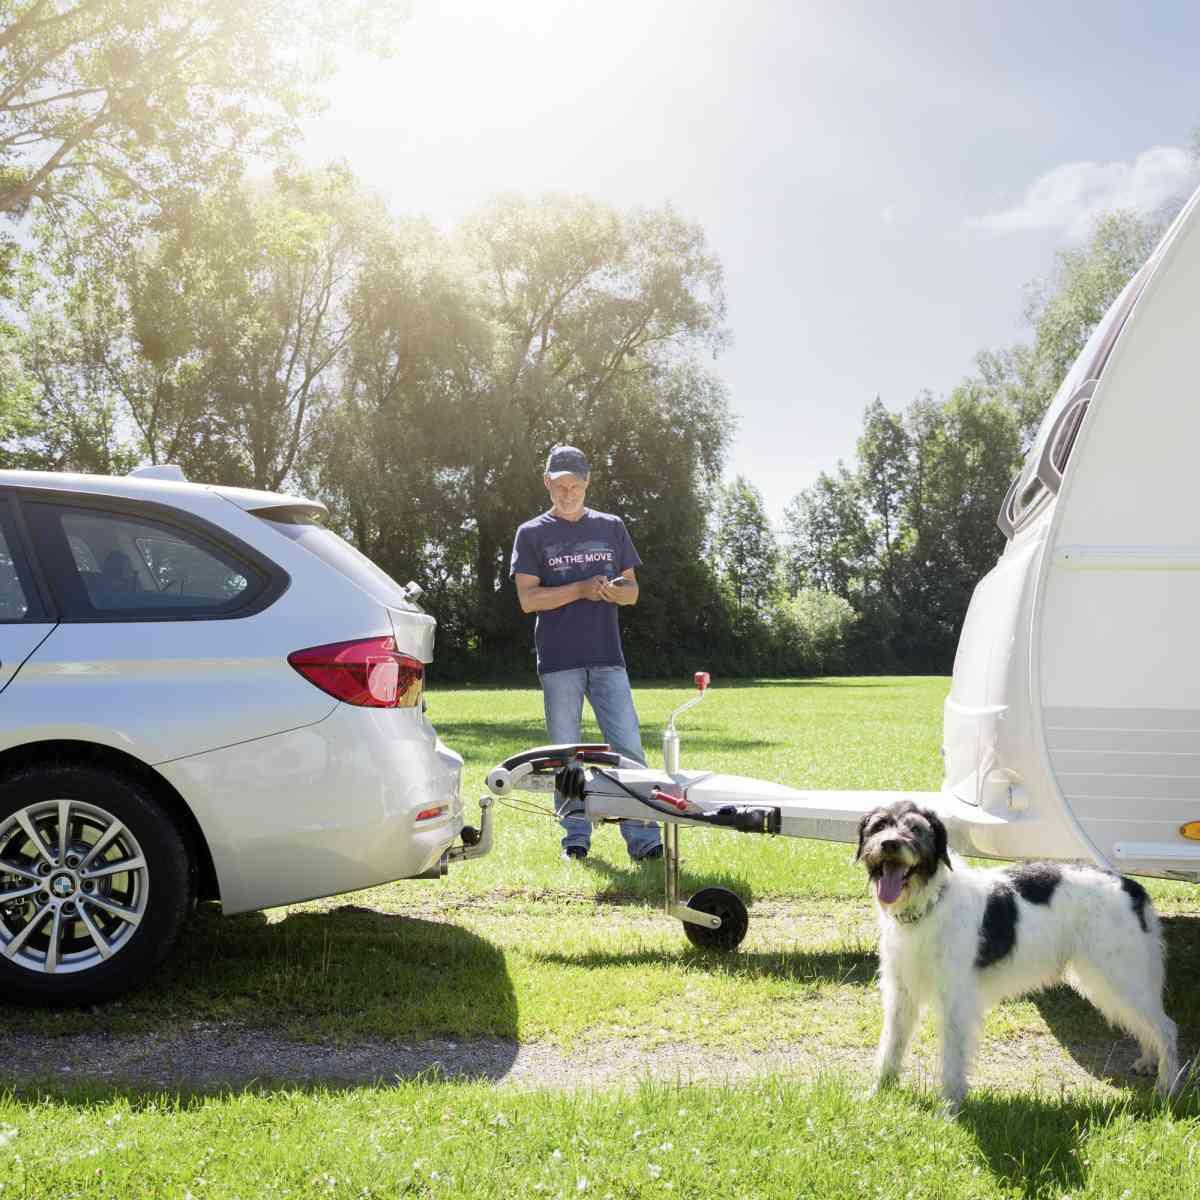 Man couples caravan with a mover on a car